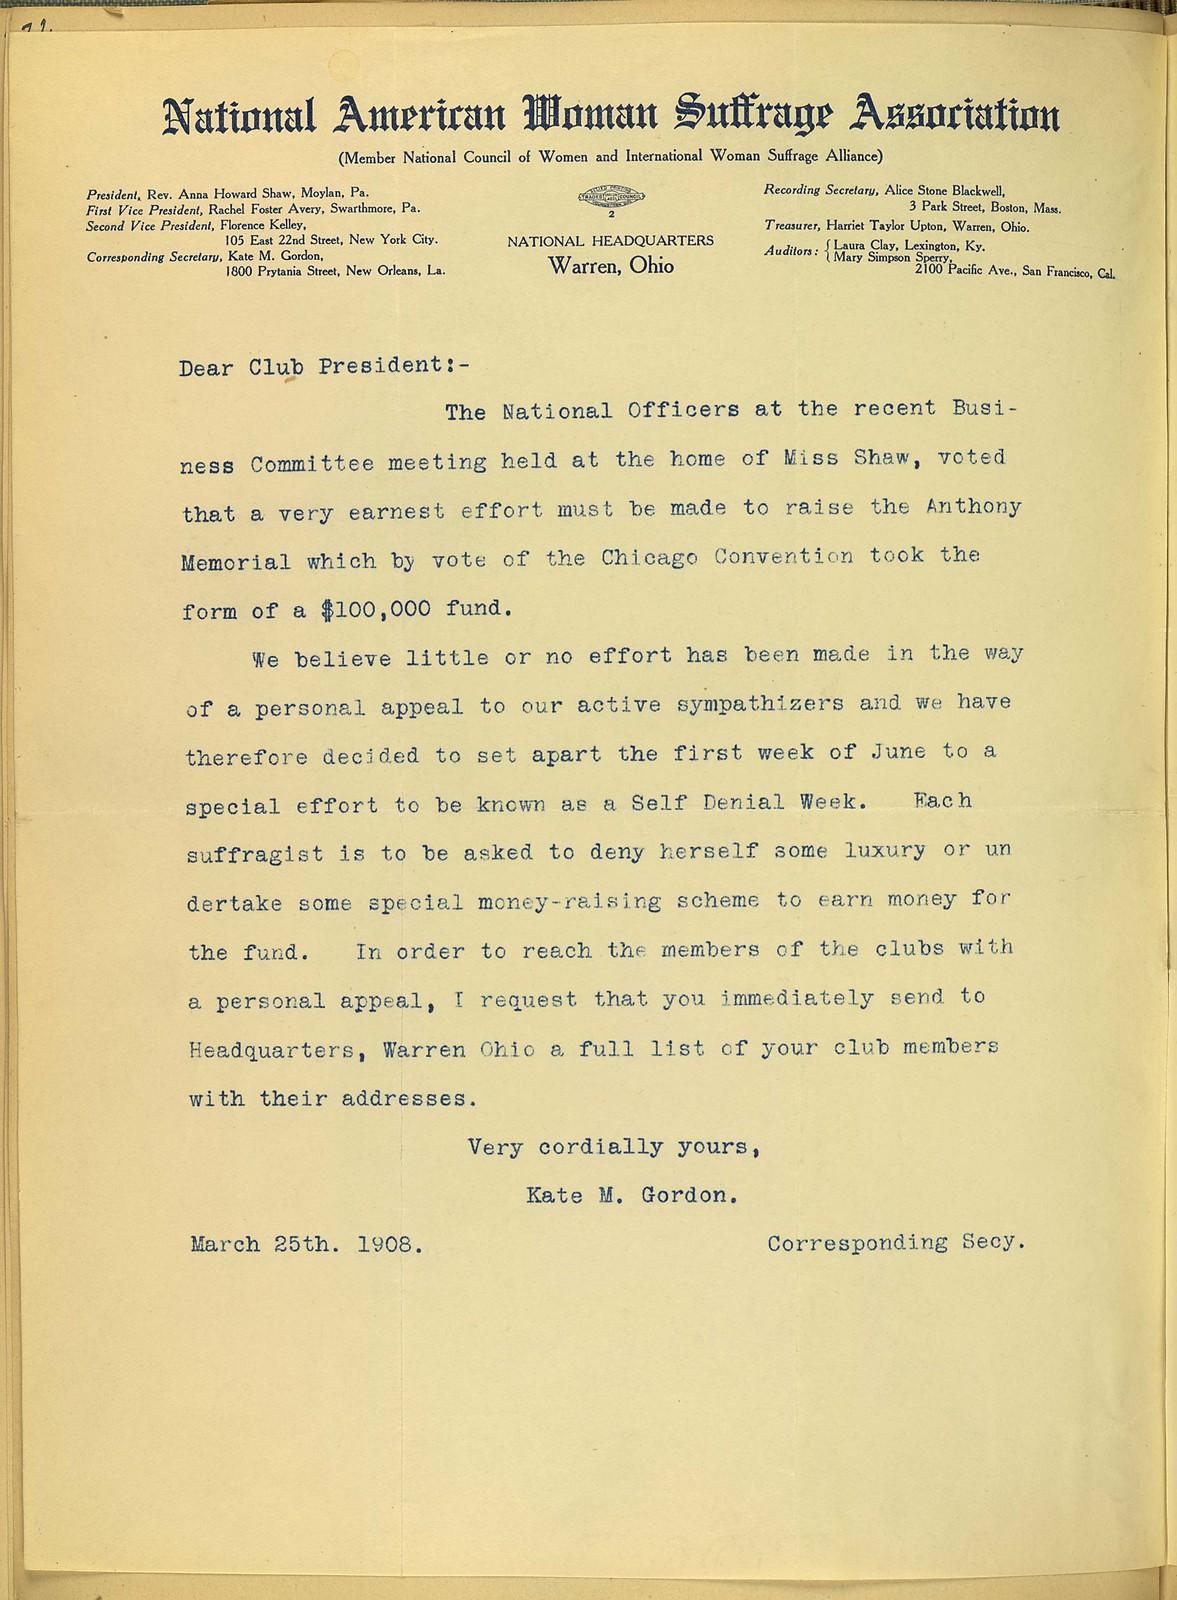 Kate M. Gordon, National American Woman Suffrage Association Corresponding Secretary, to Club President